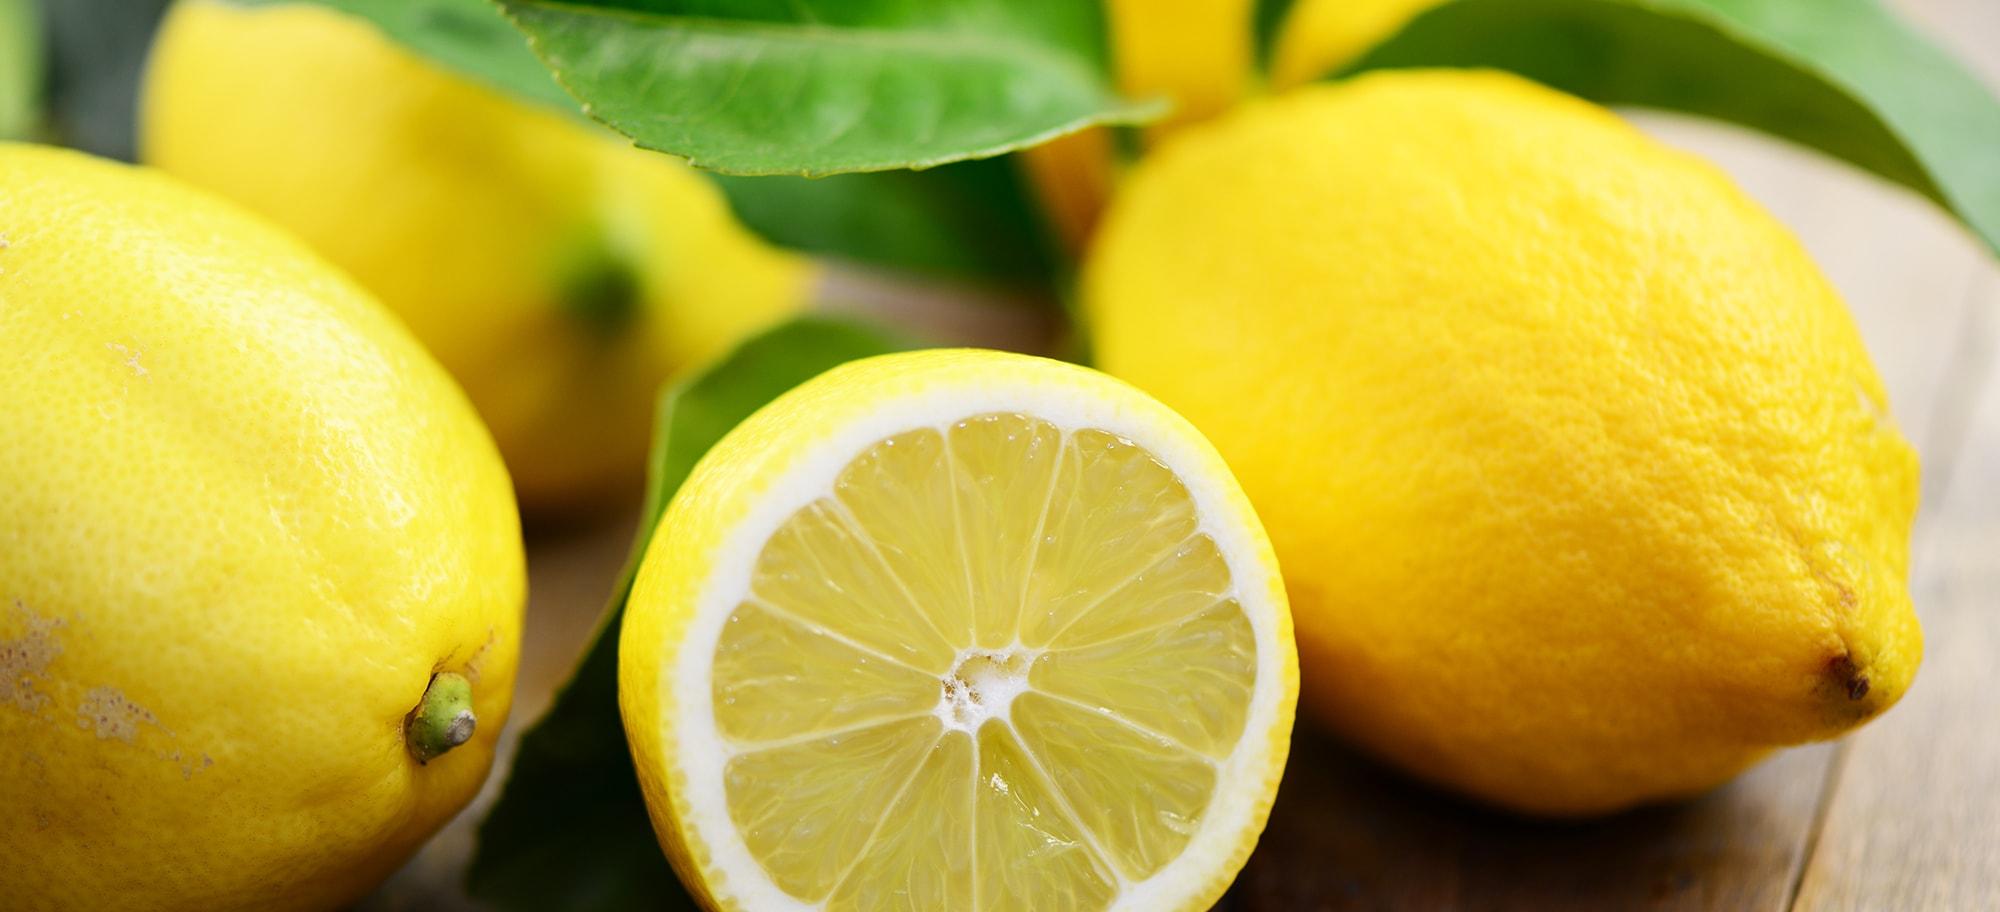 Taneks citrus